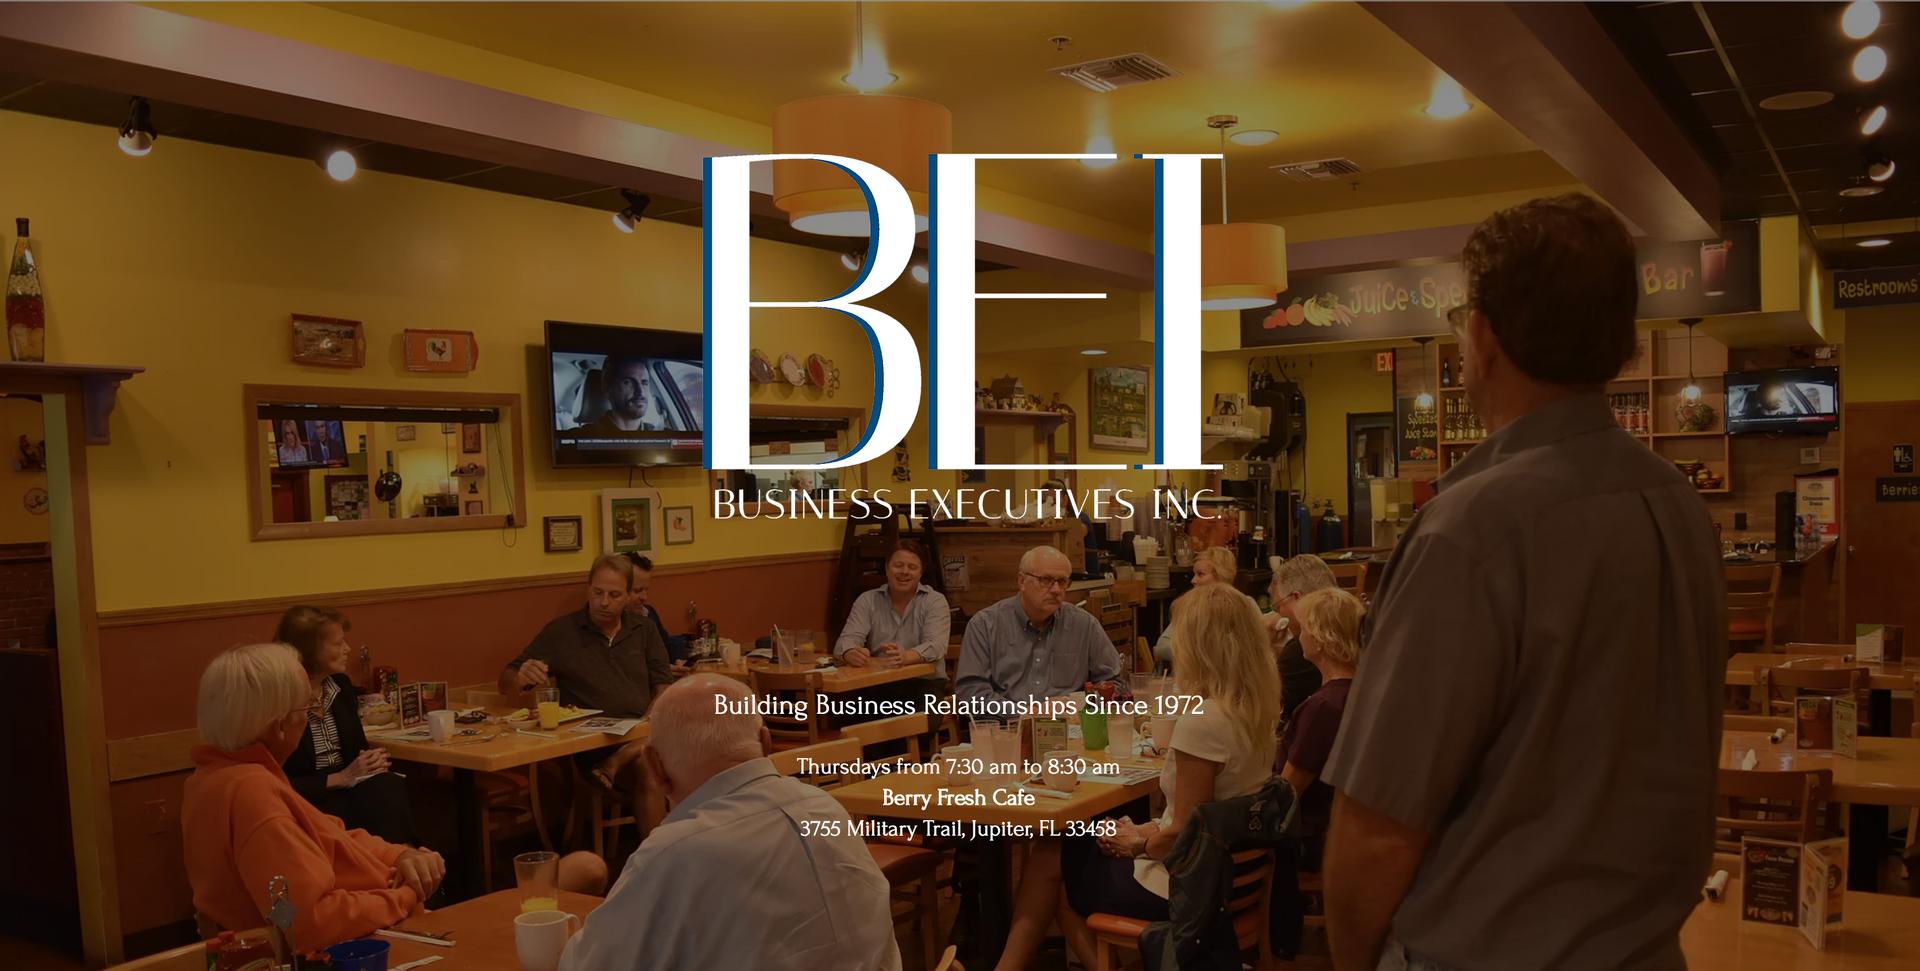 Business Executives, Inc.